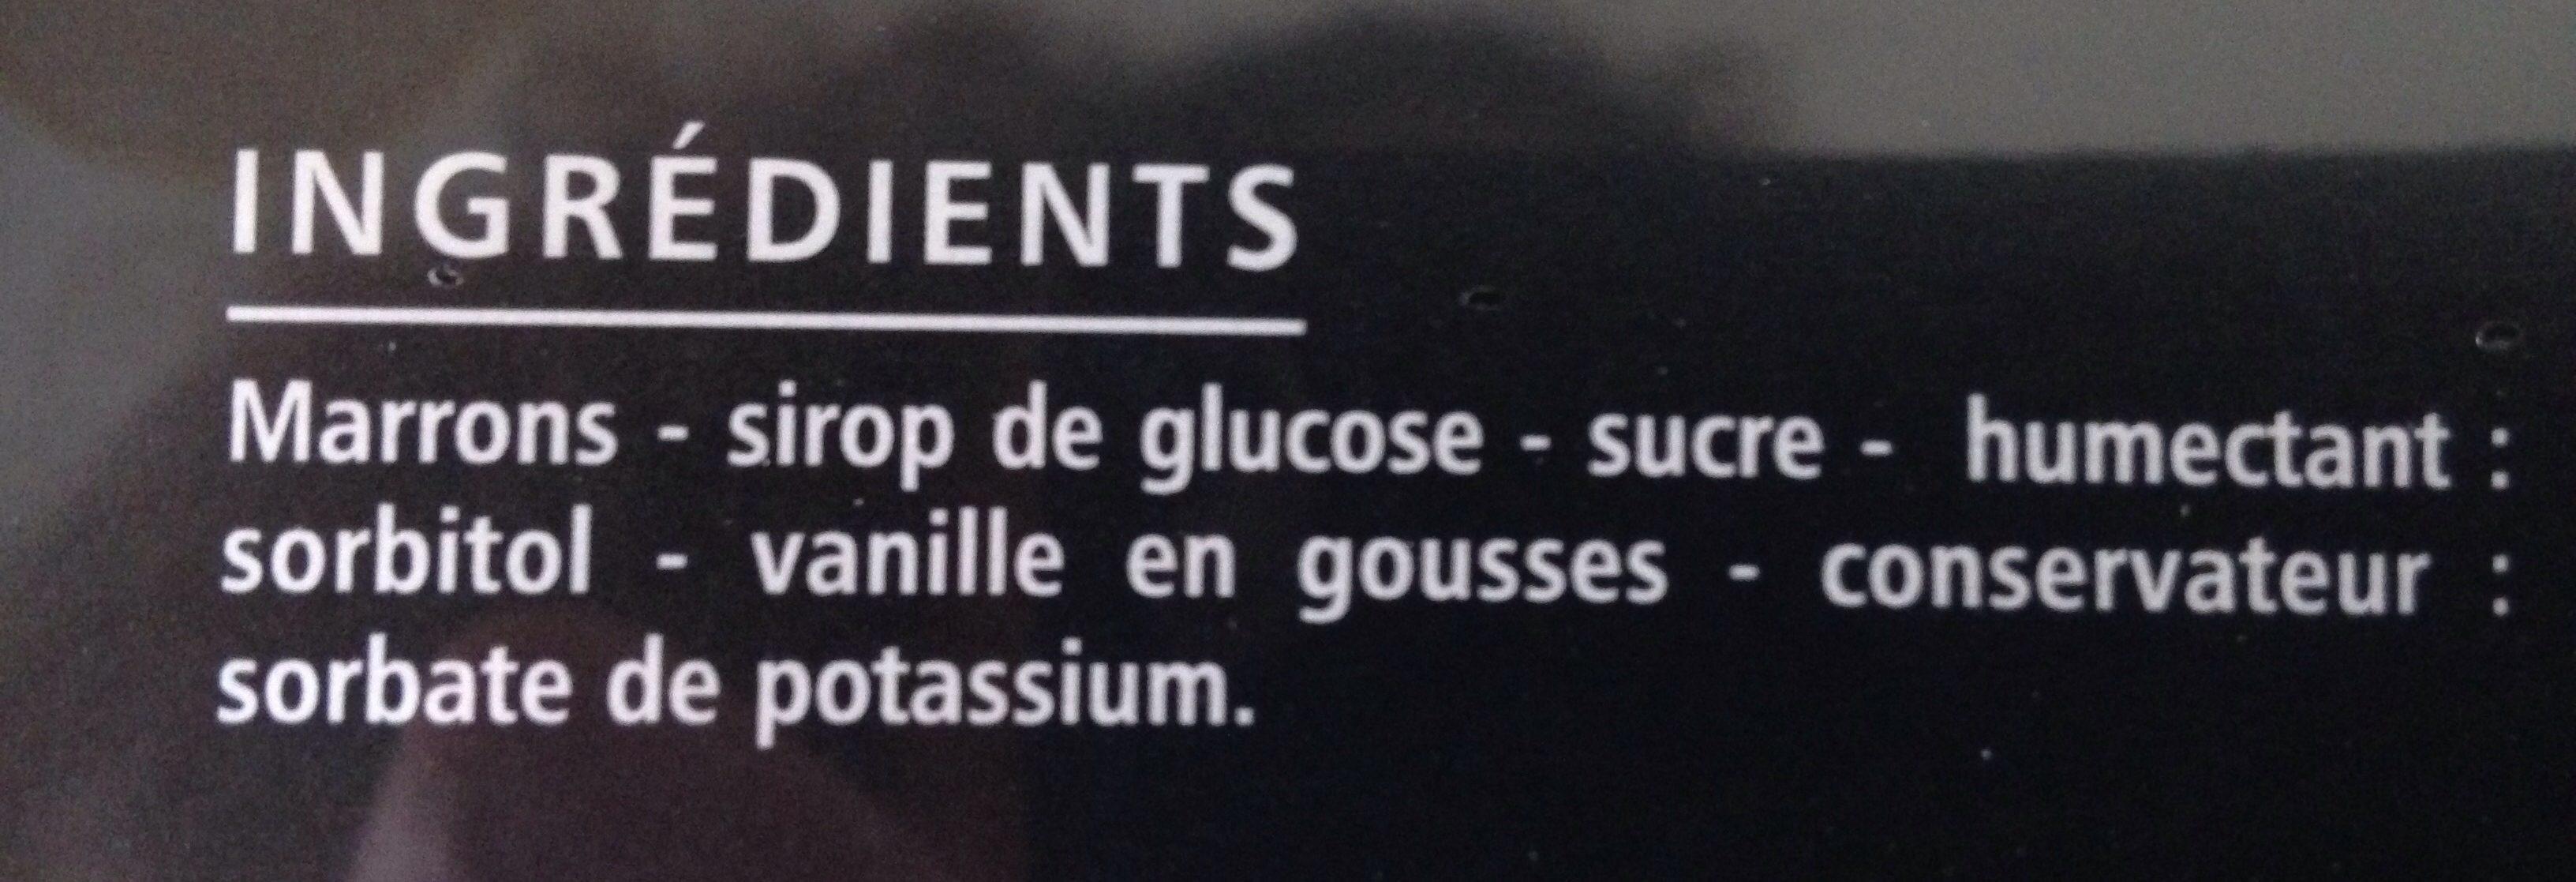 10 Marrons Glacés premium 200g Casino Delices - Ingredients - fr